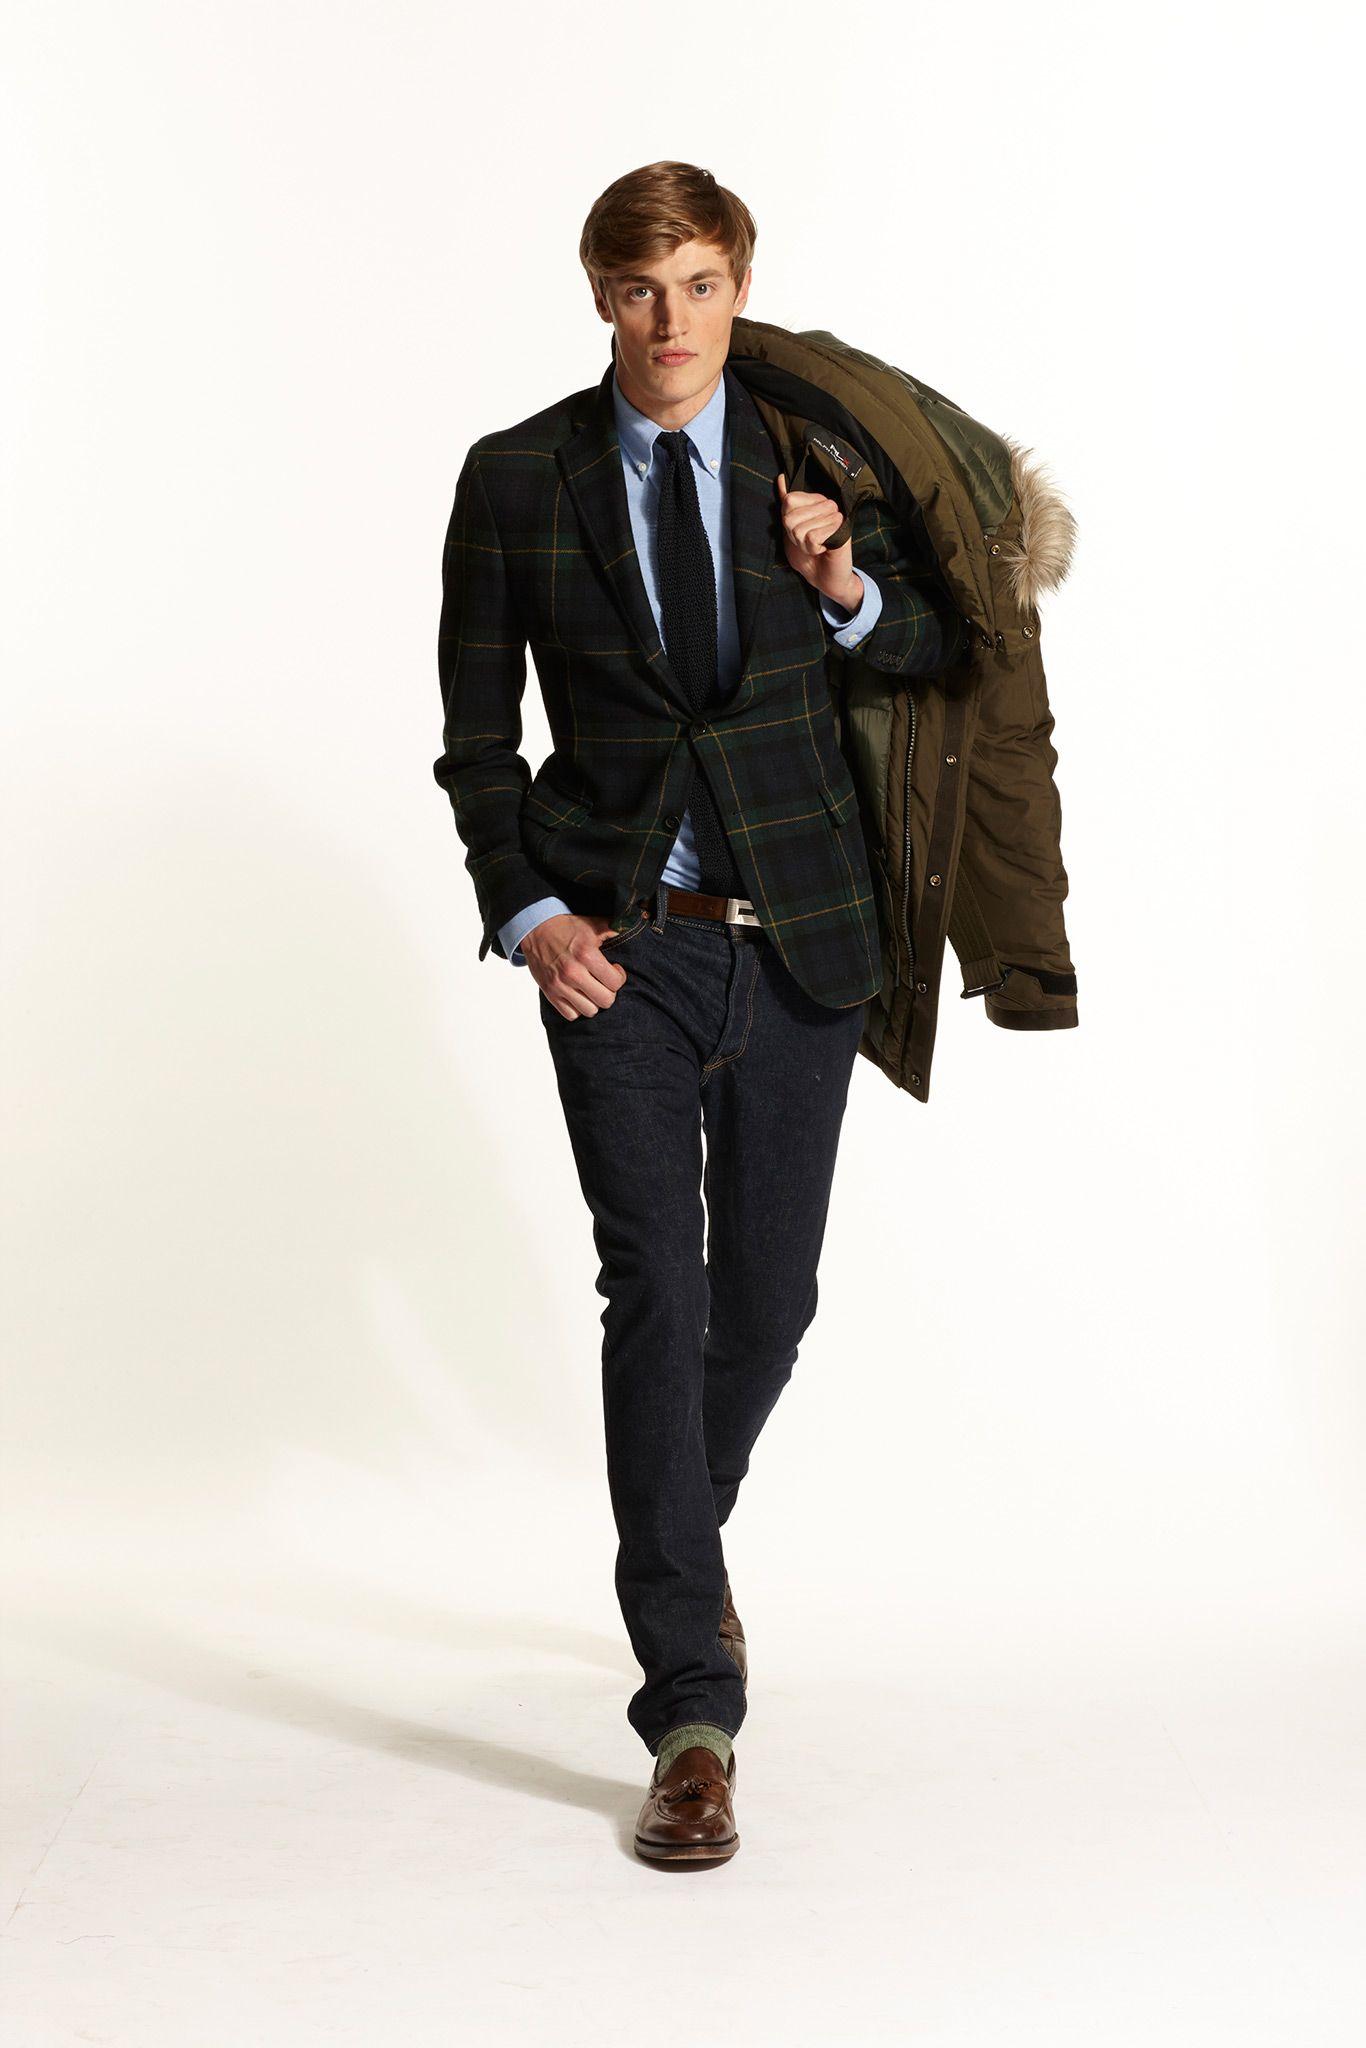 Ralph Lauren - Fall 2015 Menswear - Look 36 of 57